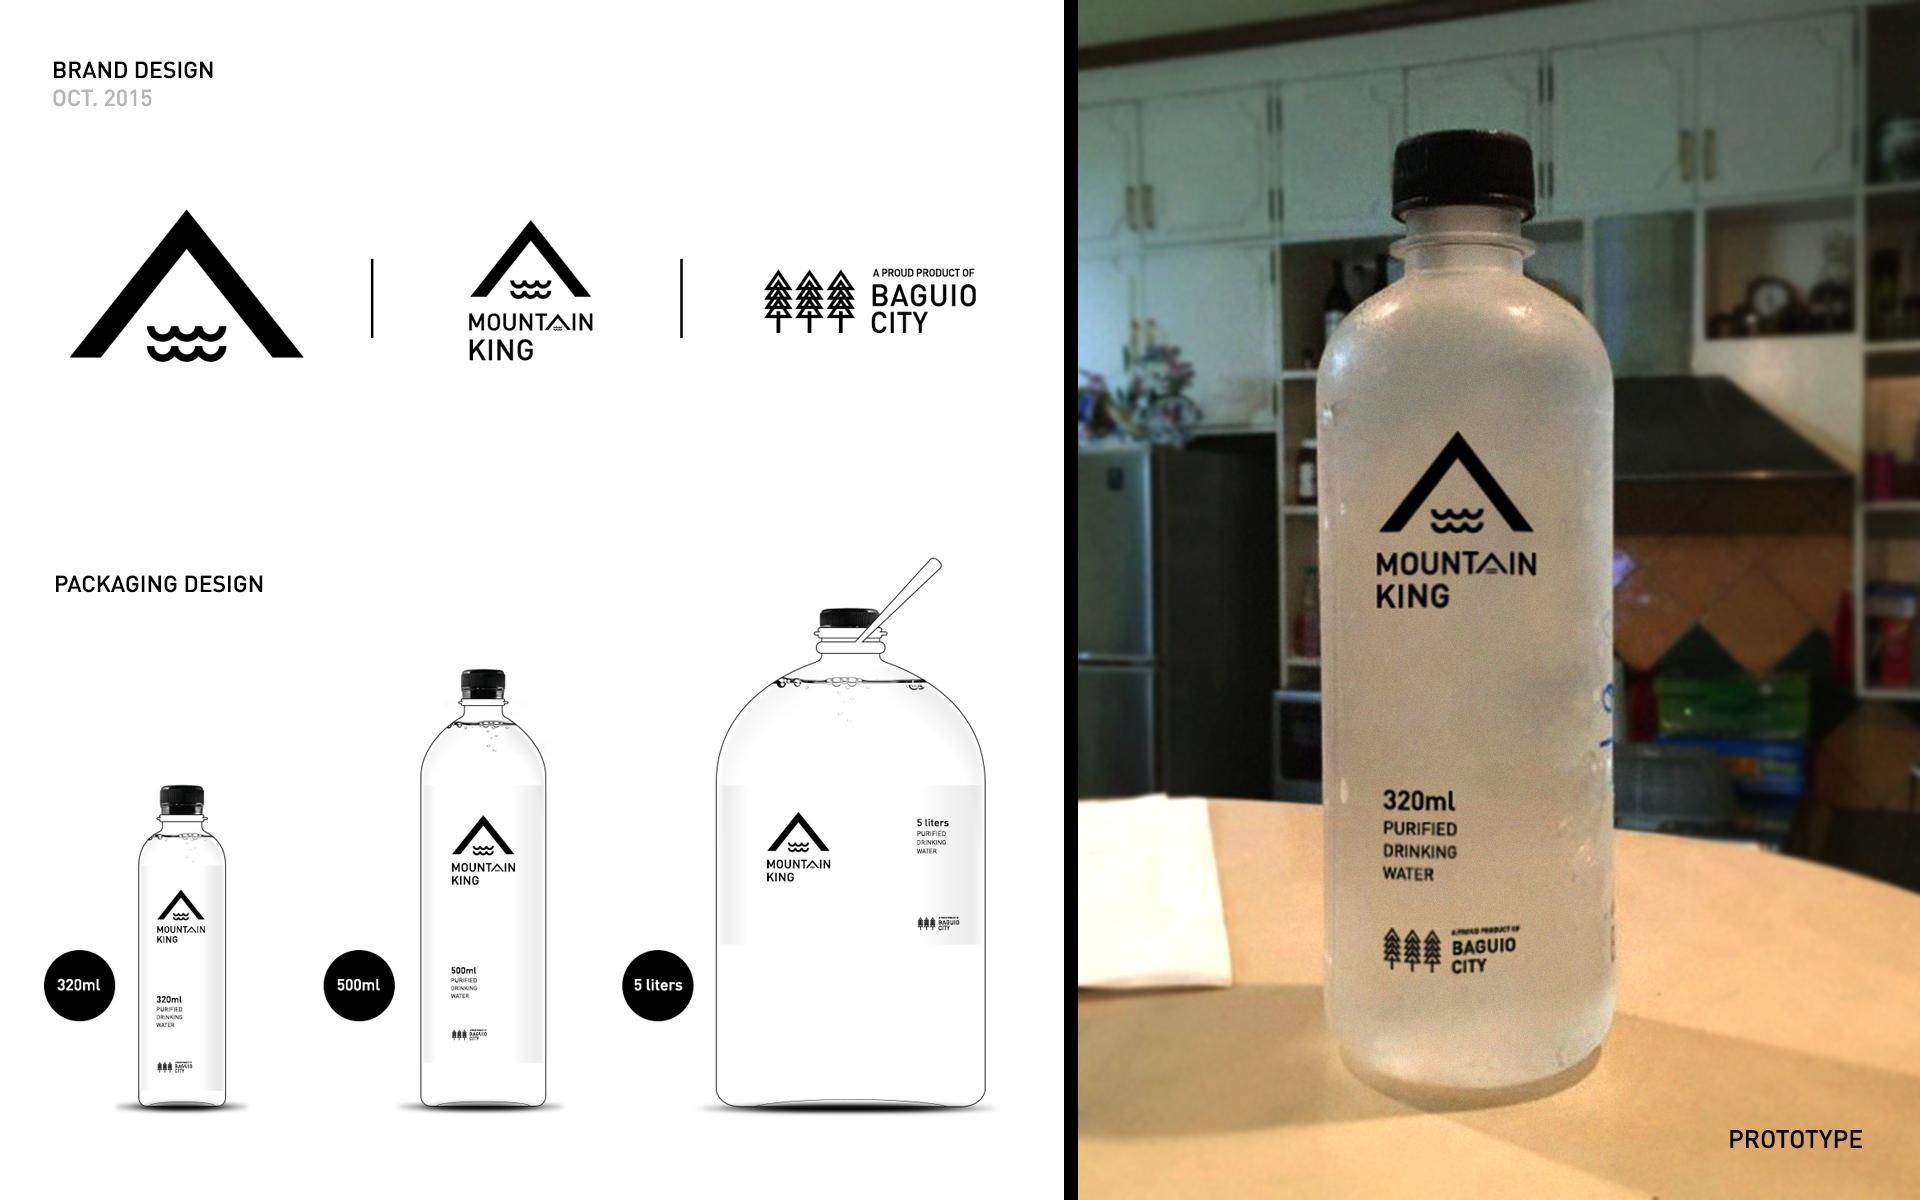 Mountain King Purified Drinking Water Brand + Packaging Design #brand #design #identity #logo #packaging #beesandvulture